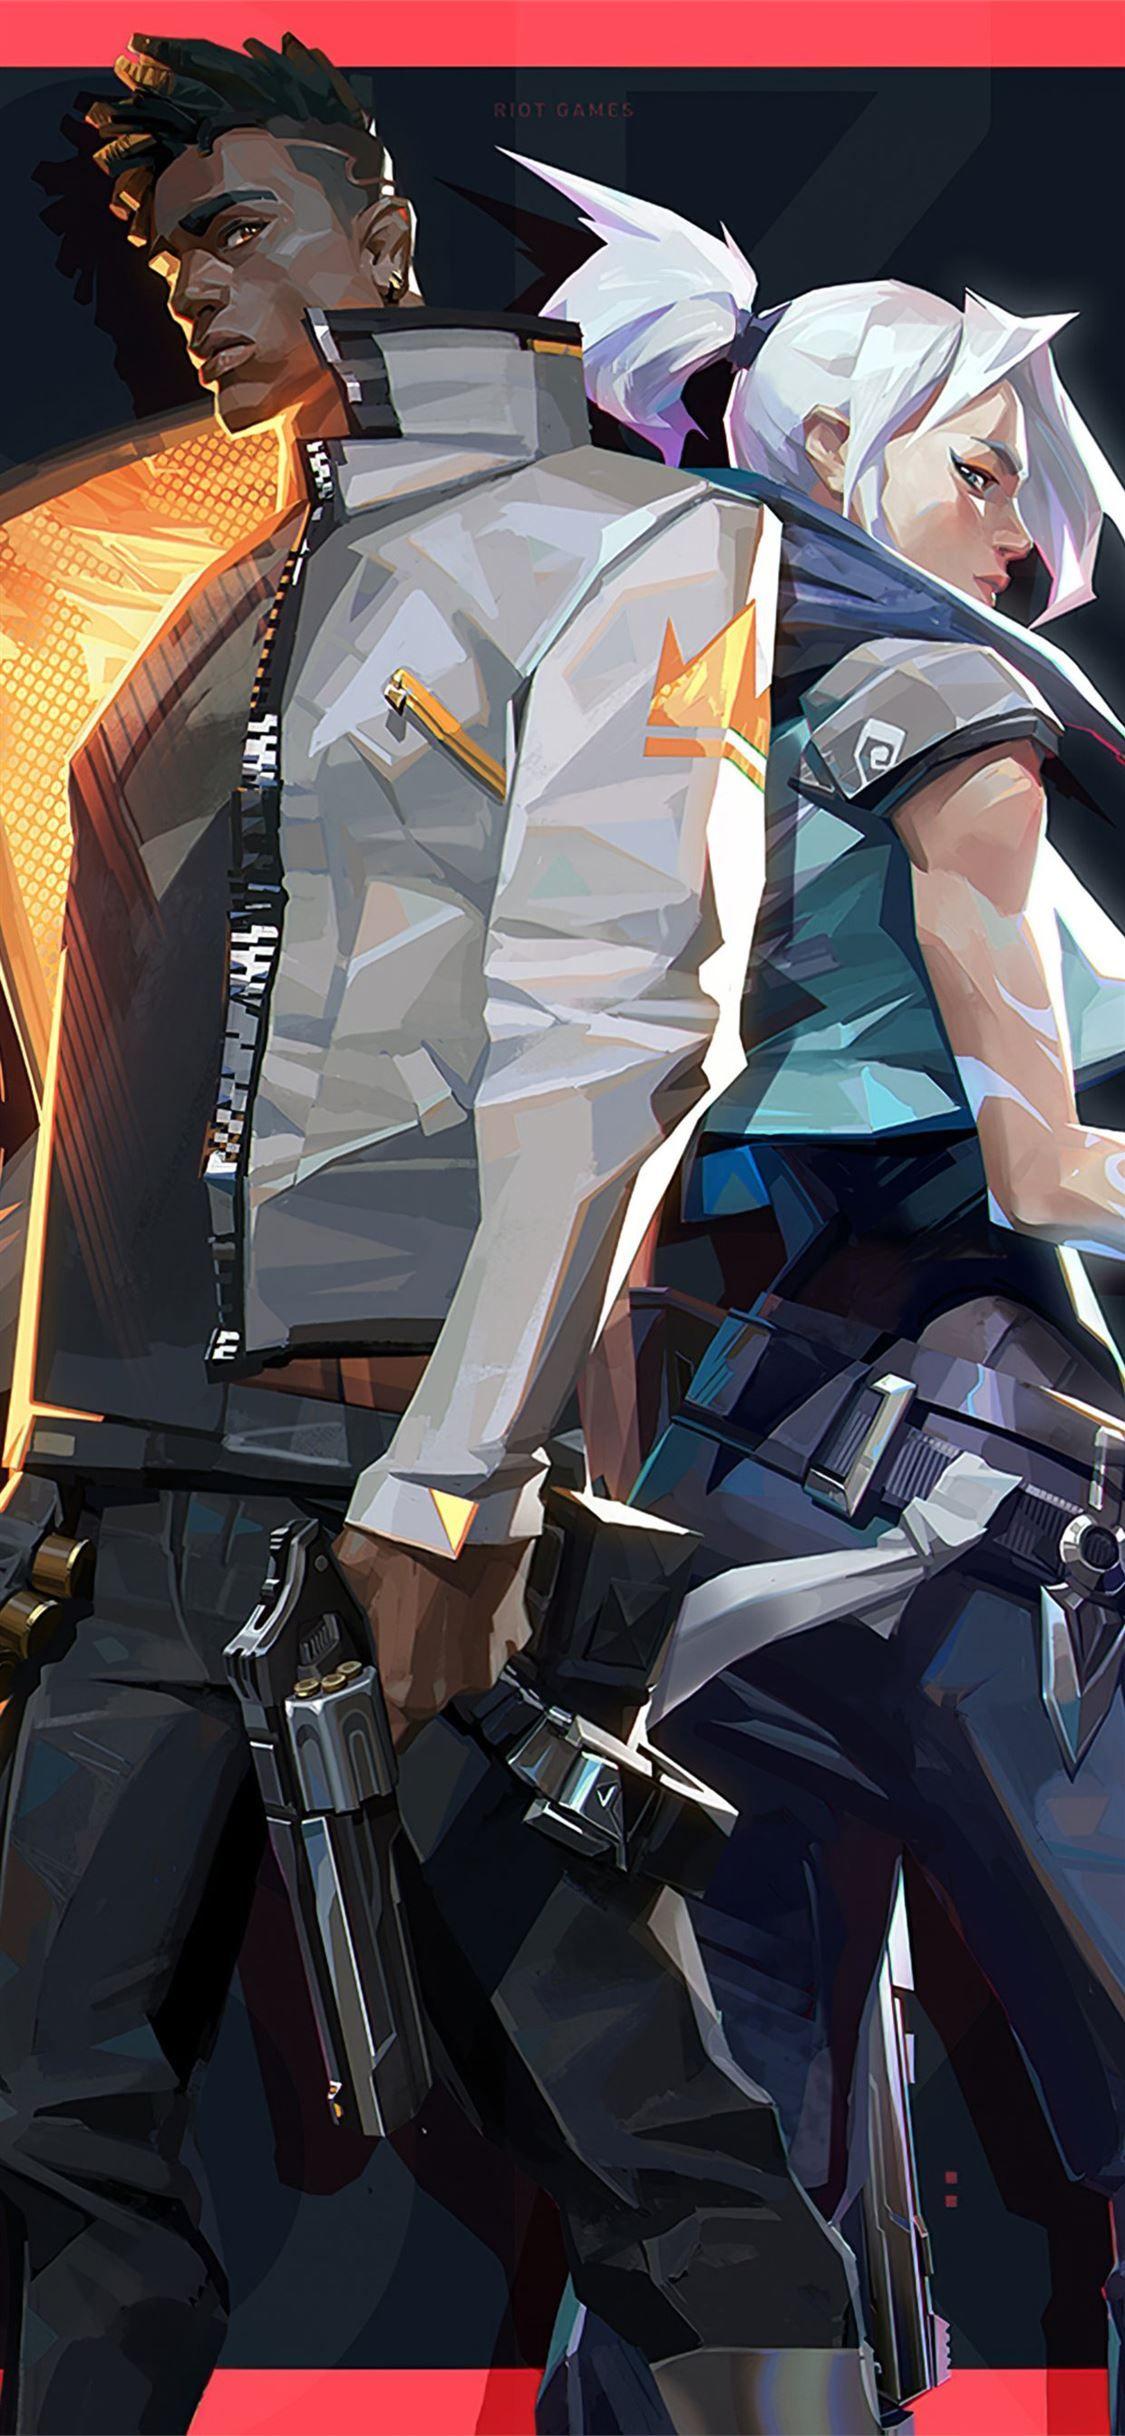 Valorant Phoenix And Jett 4k Valorant Games 4k 2020games Iphone11wallpaper In 2020 Phoenix Wallpaper Anime Character Design Phoenix Art